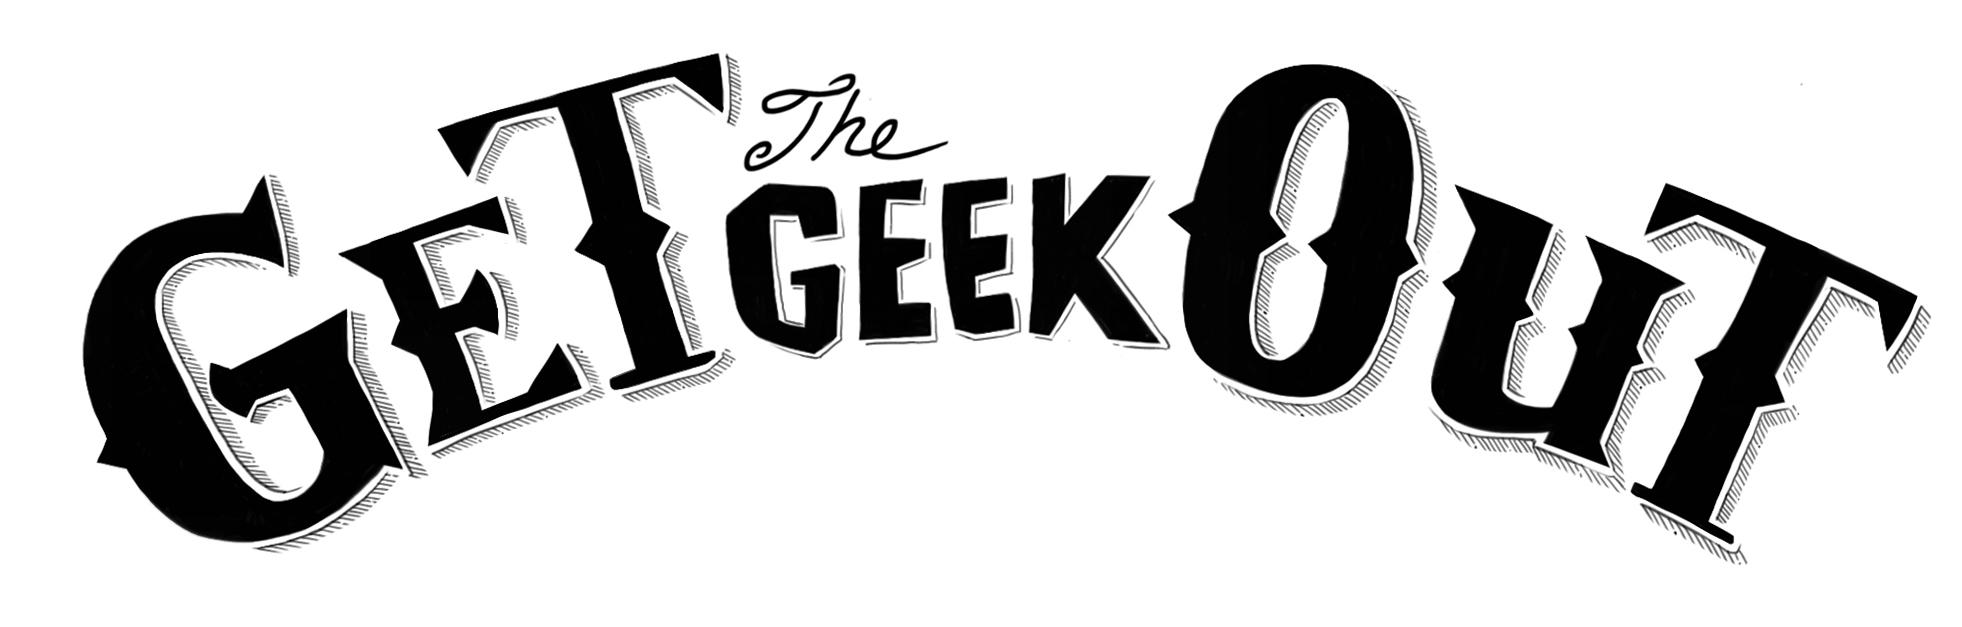 getthegeekout-logo1b2-final.jpg